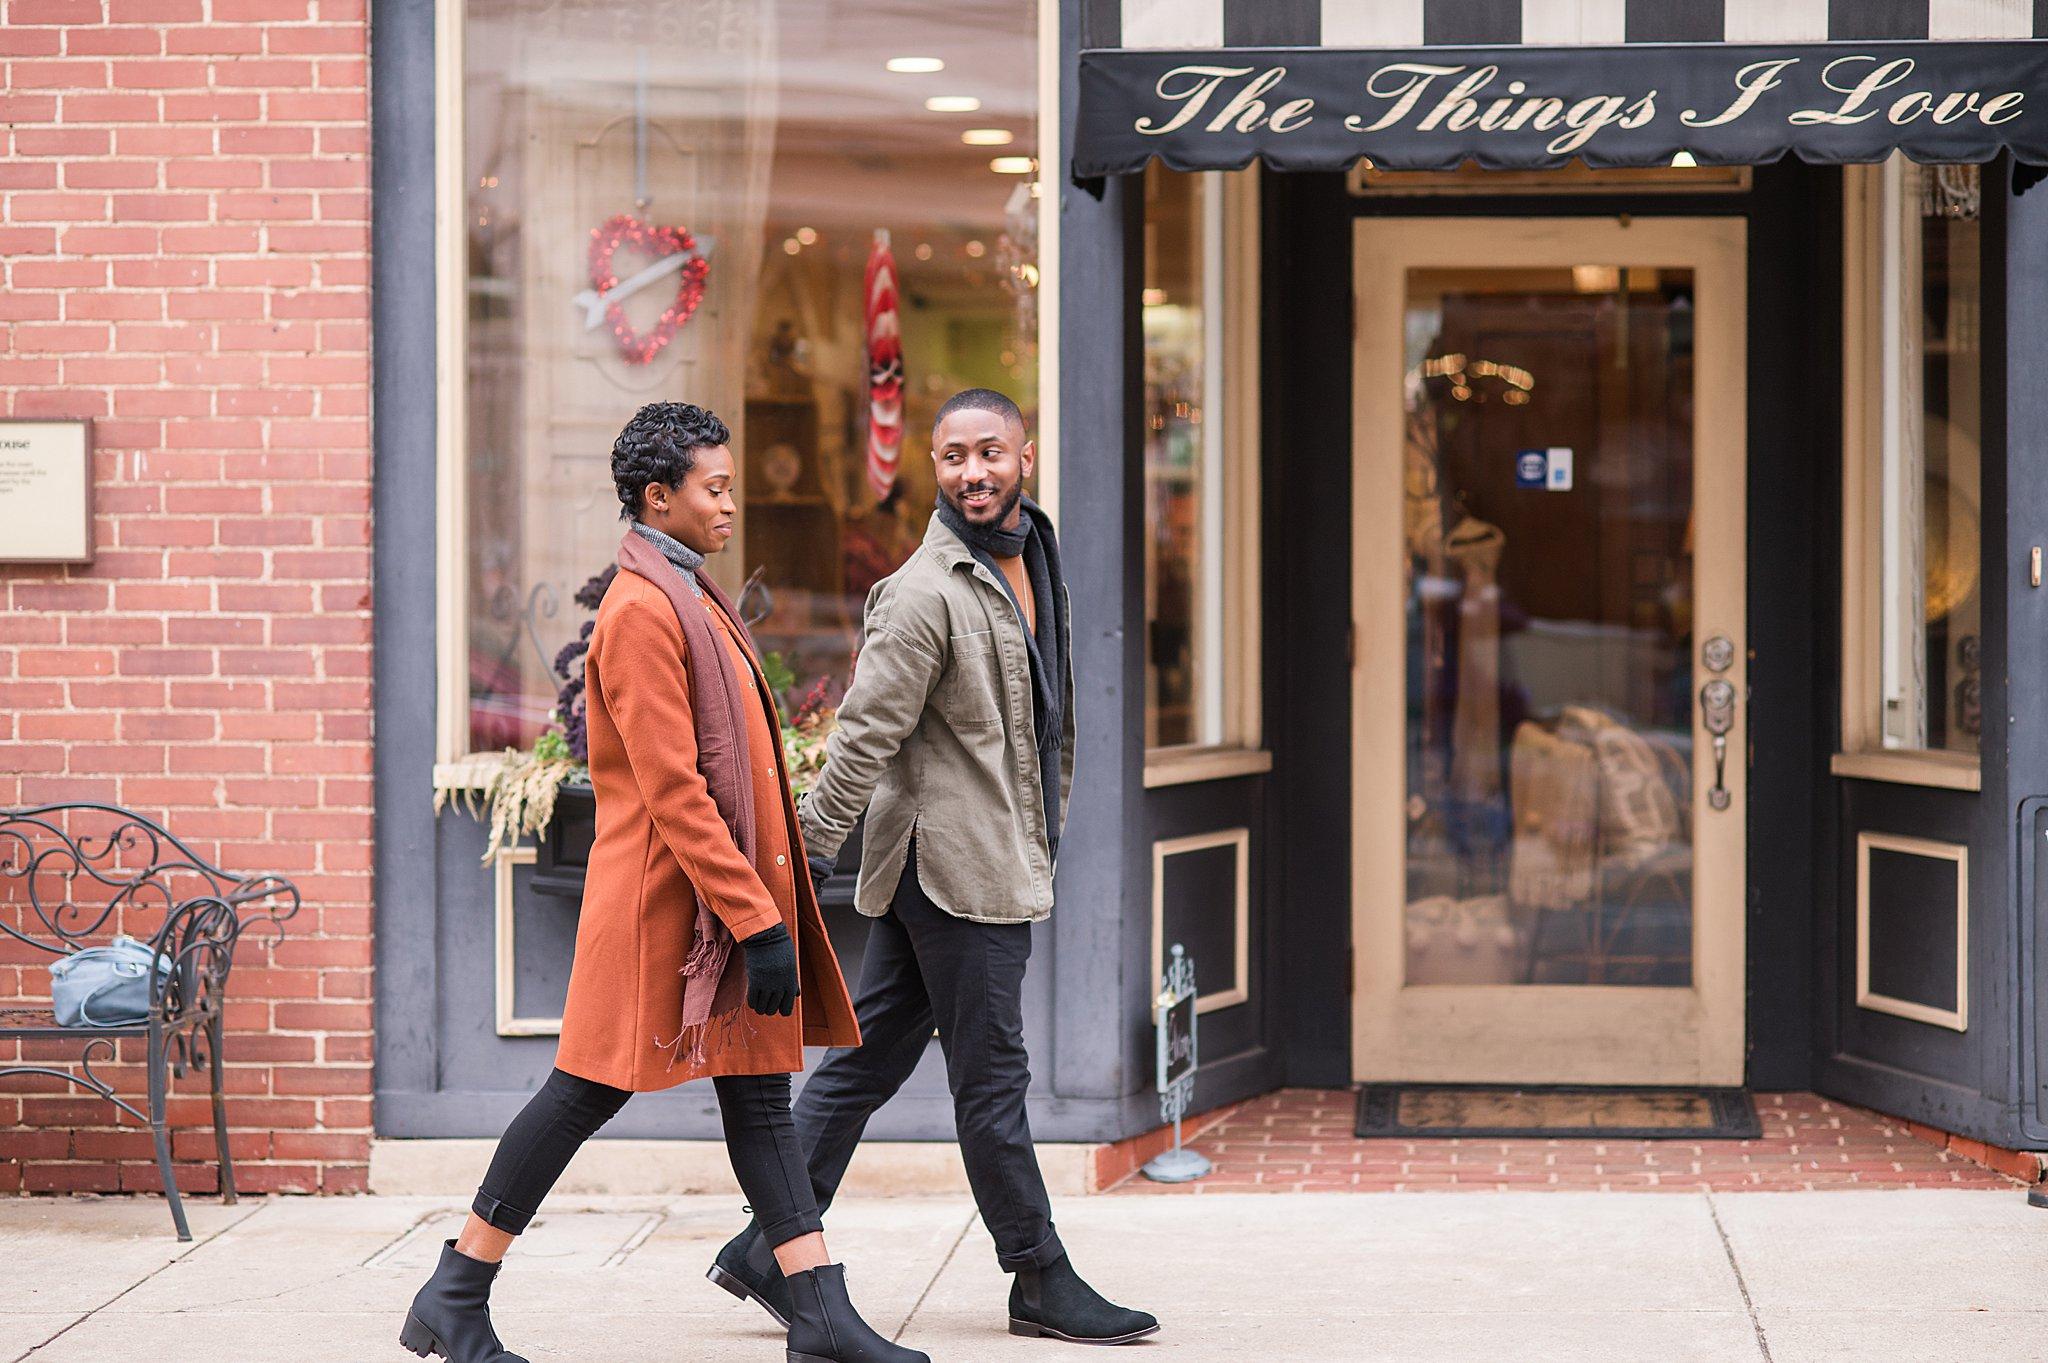 Engaged couple walking down sidewalk